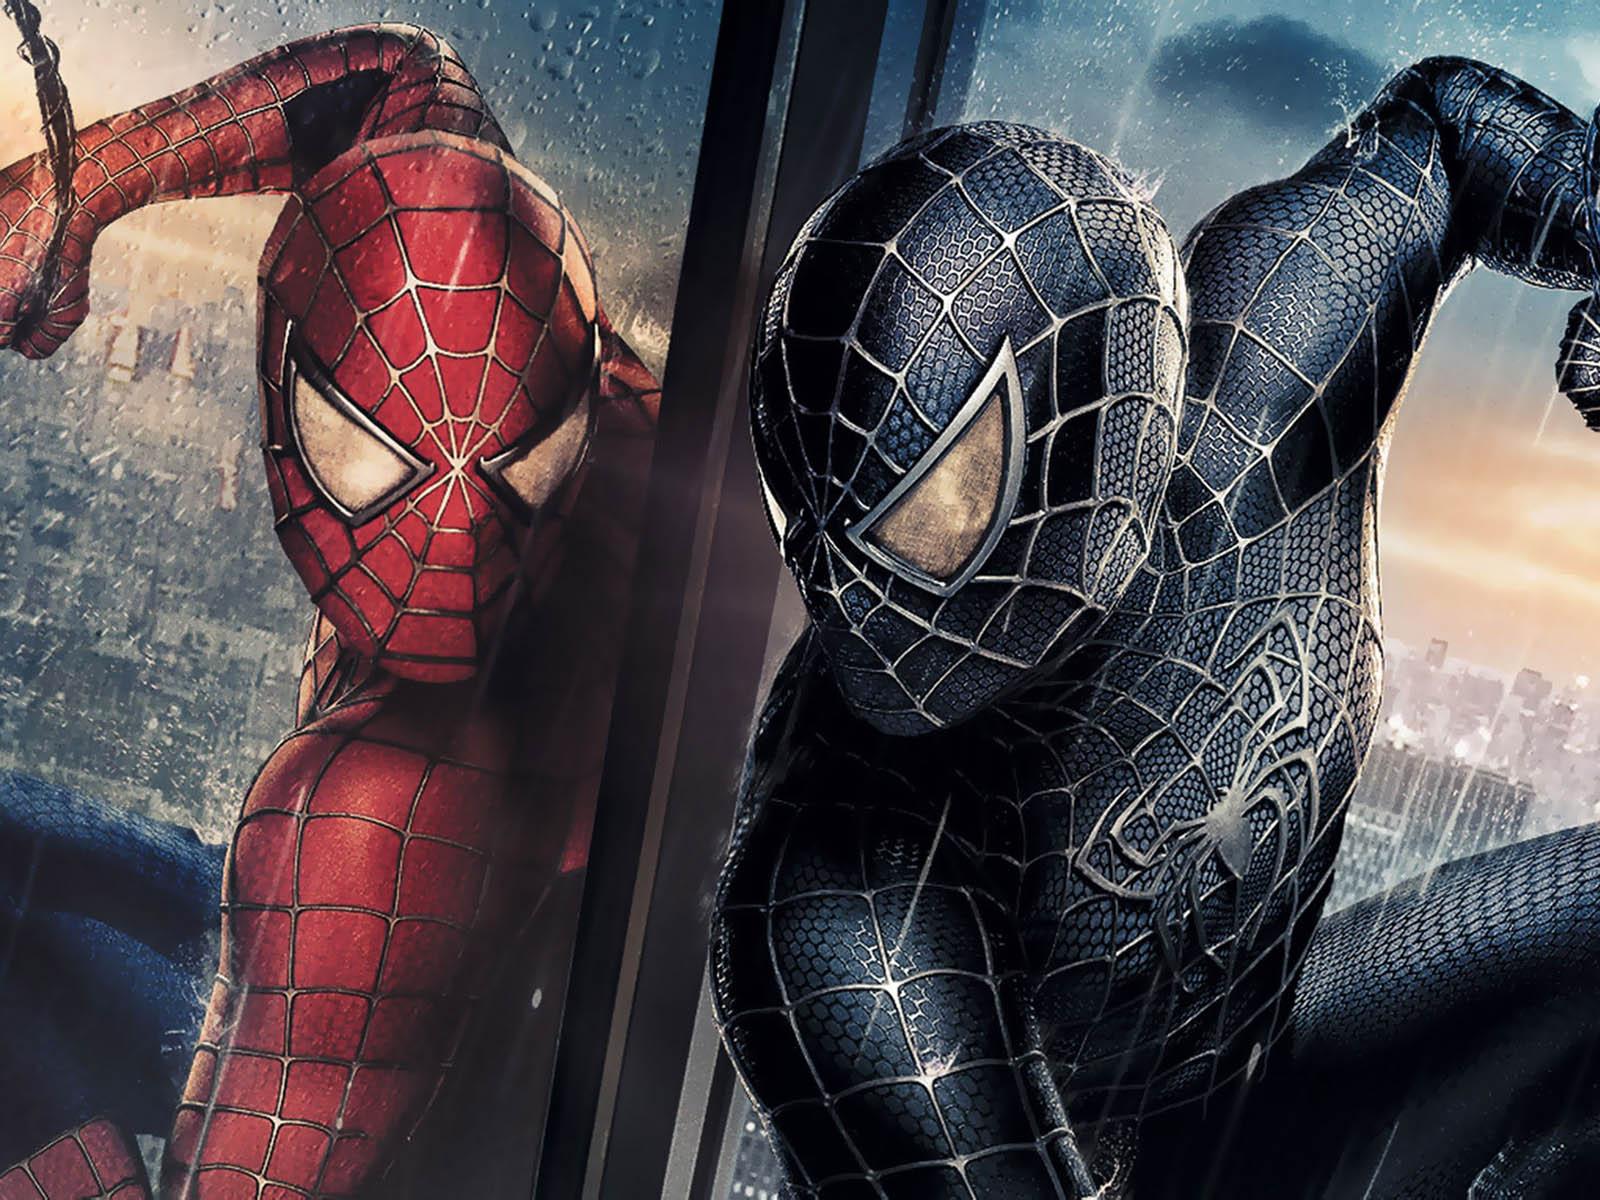 49 Spiderman 3 Wallpapers Free Download On Wallpapersafari